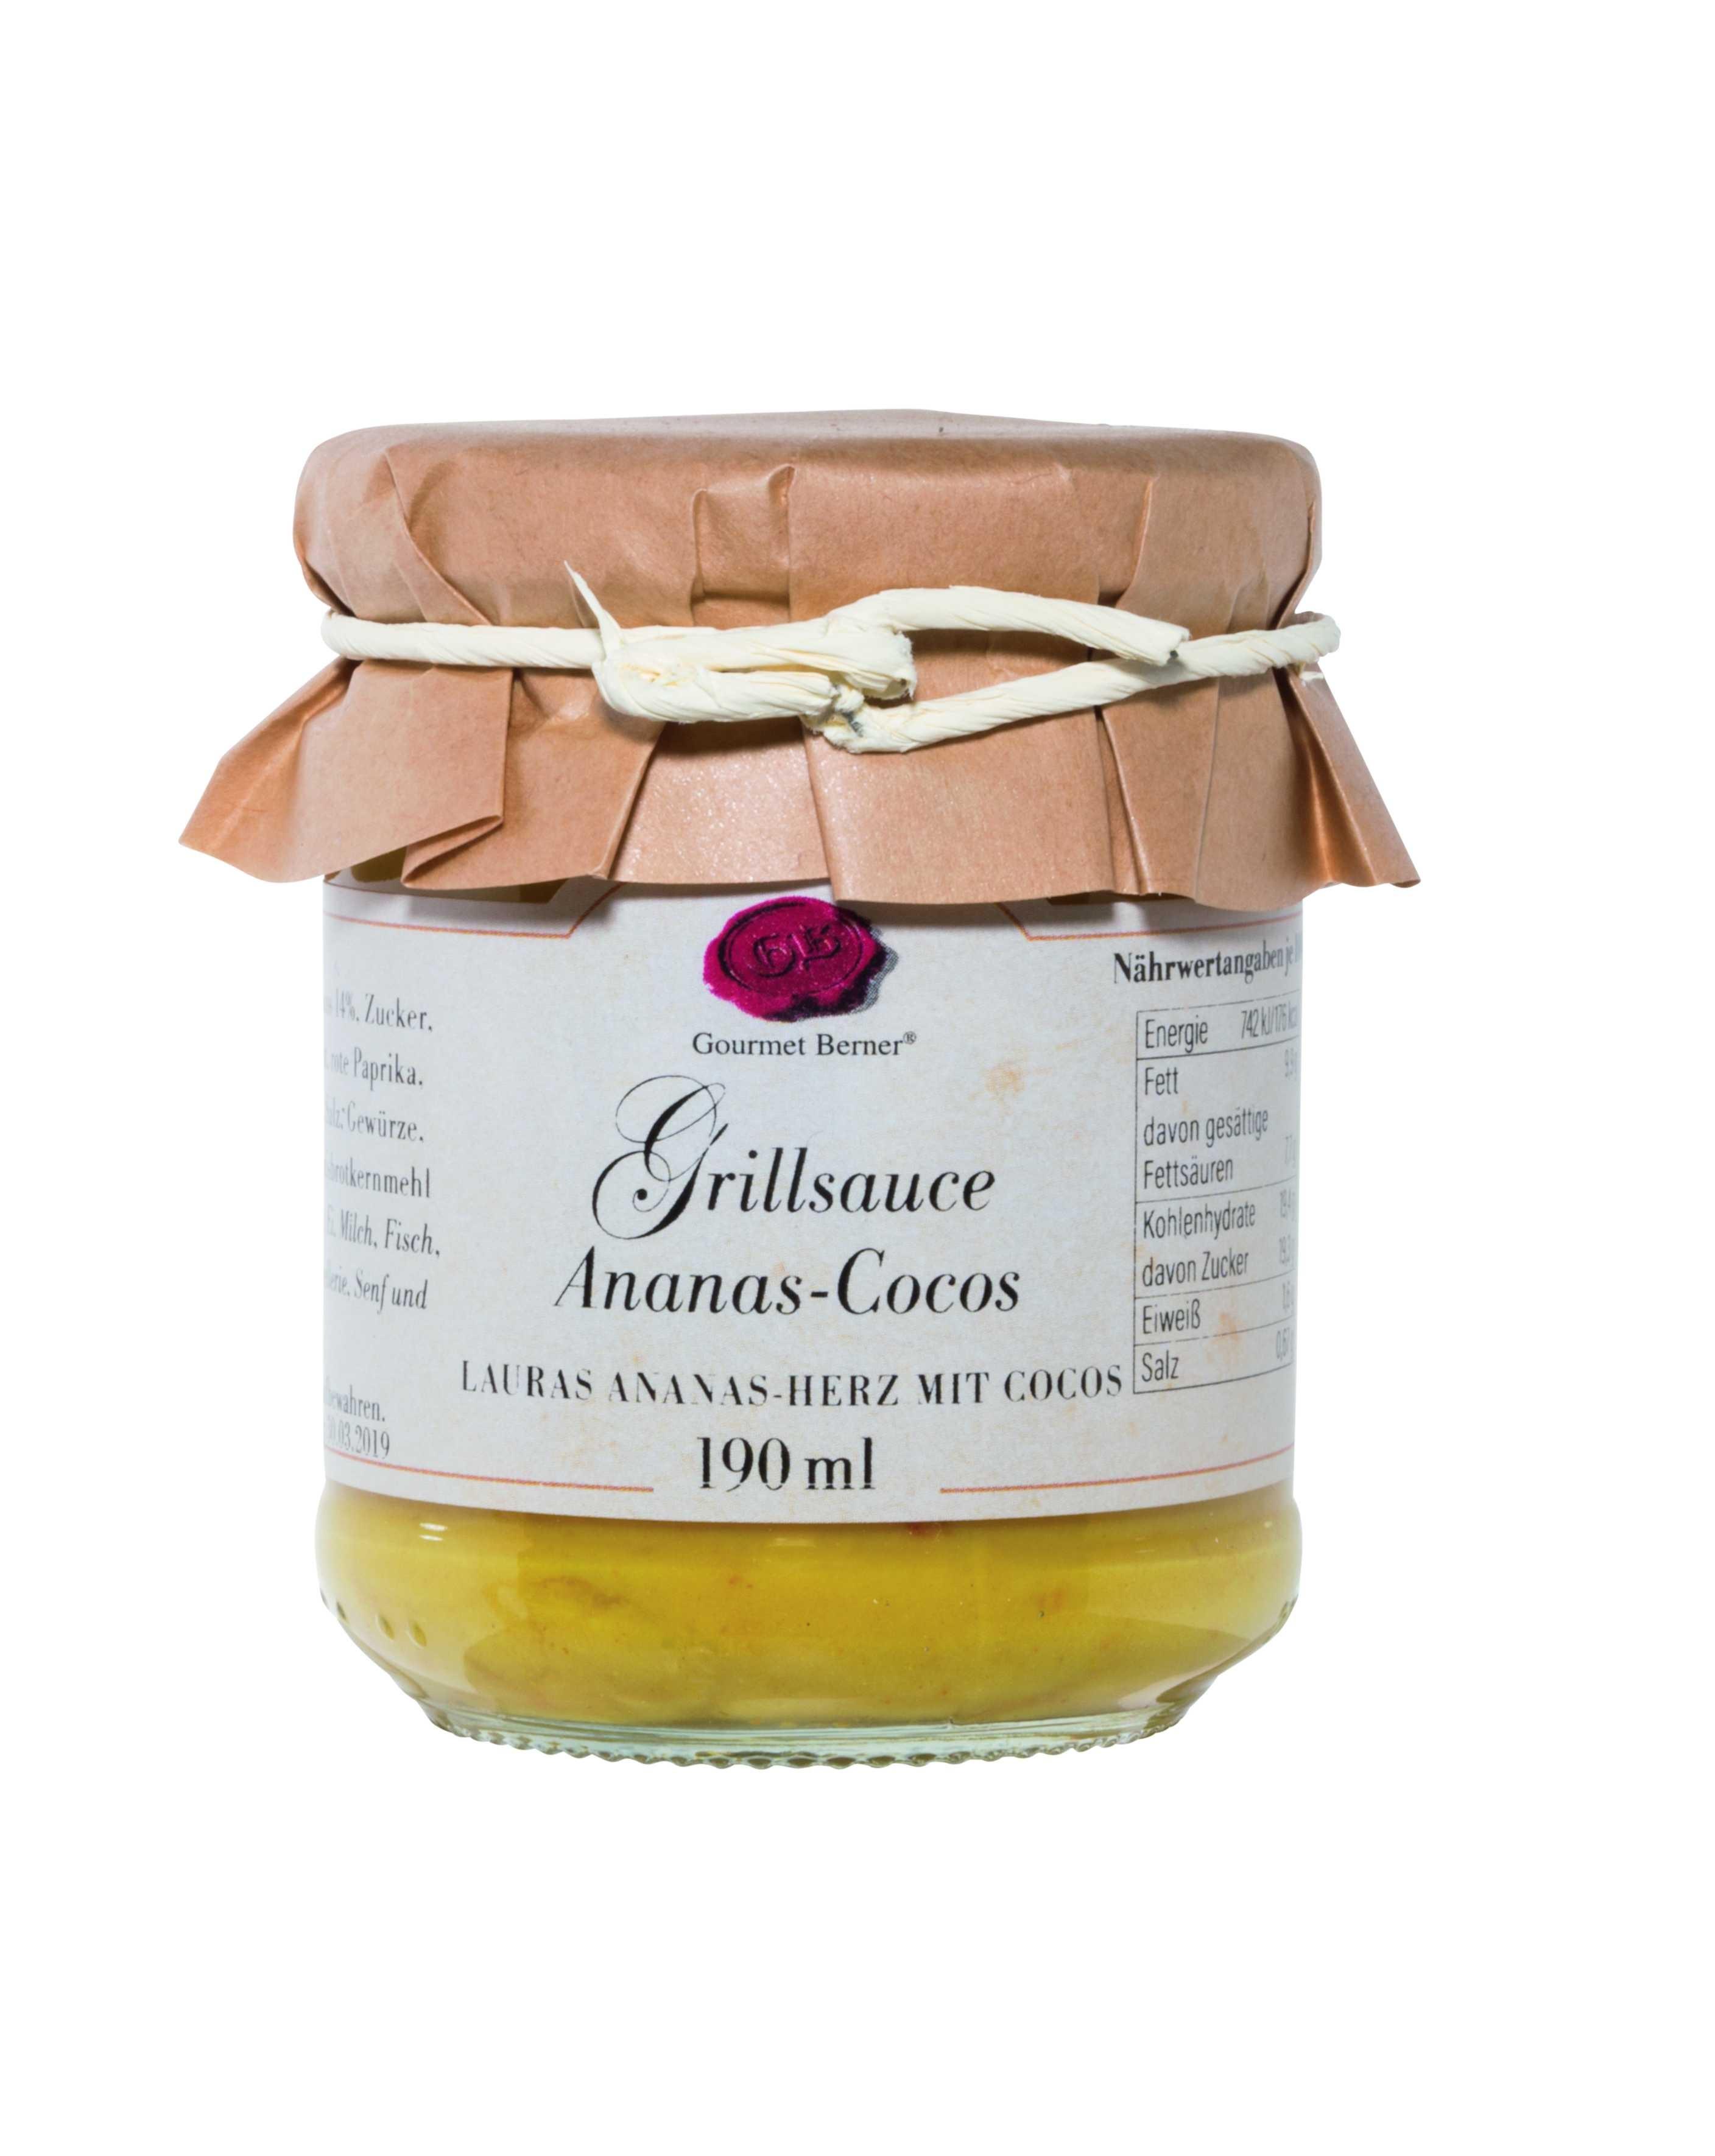 Grillsauce Ananas Cocos (Lauras Ananas-Herz mit Cocos Grillsauce), 190ml Glas